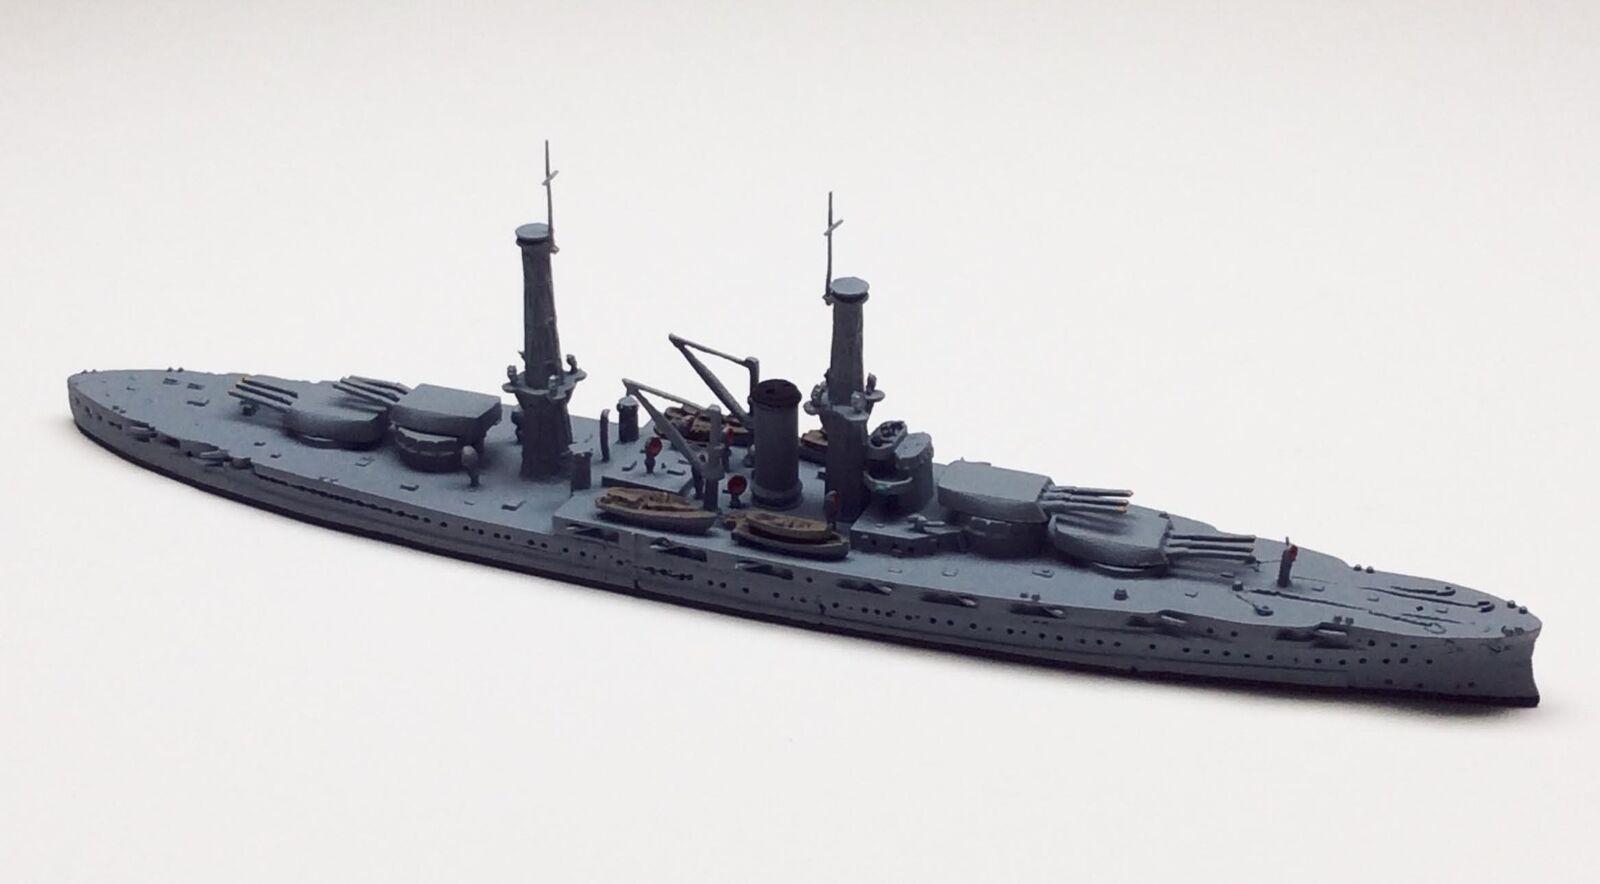 Navis 303N US corazzata Arizona 1916 11250 SCALA modelloLO DI NAVE